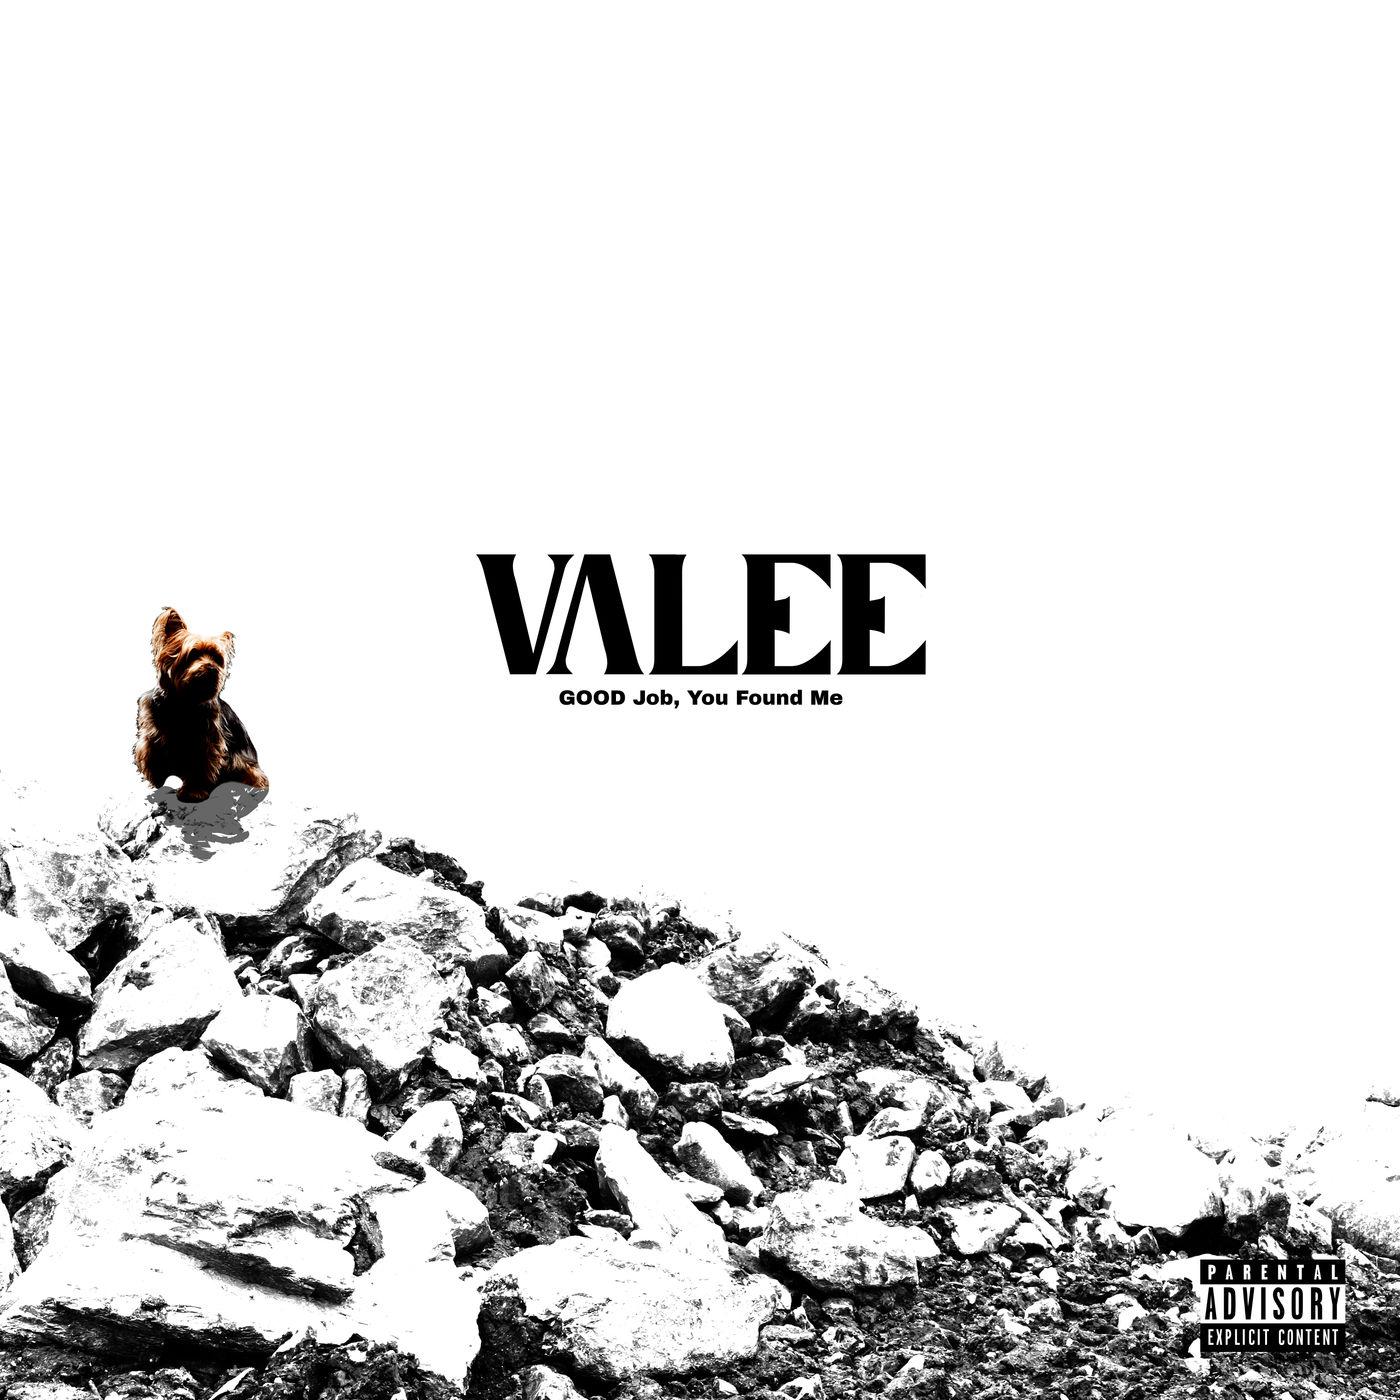 Valee – GOOD Job, You Found Me